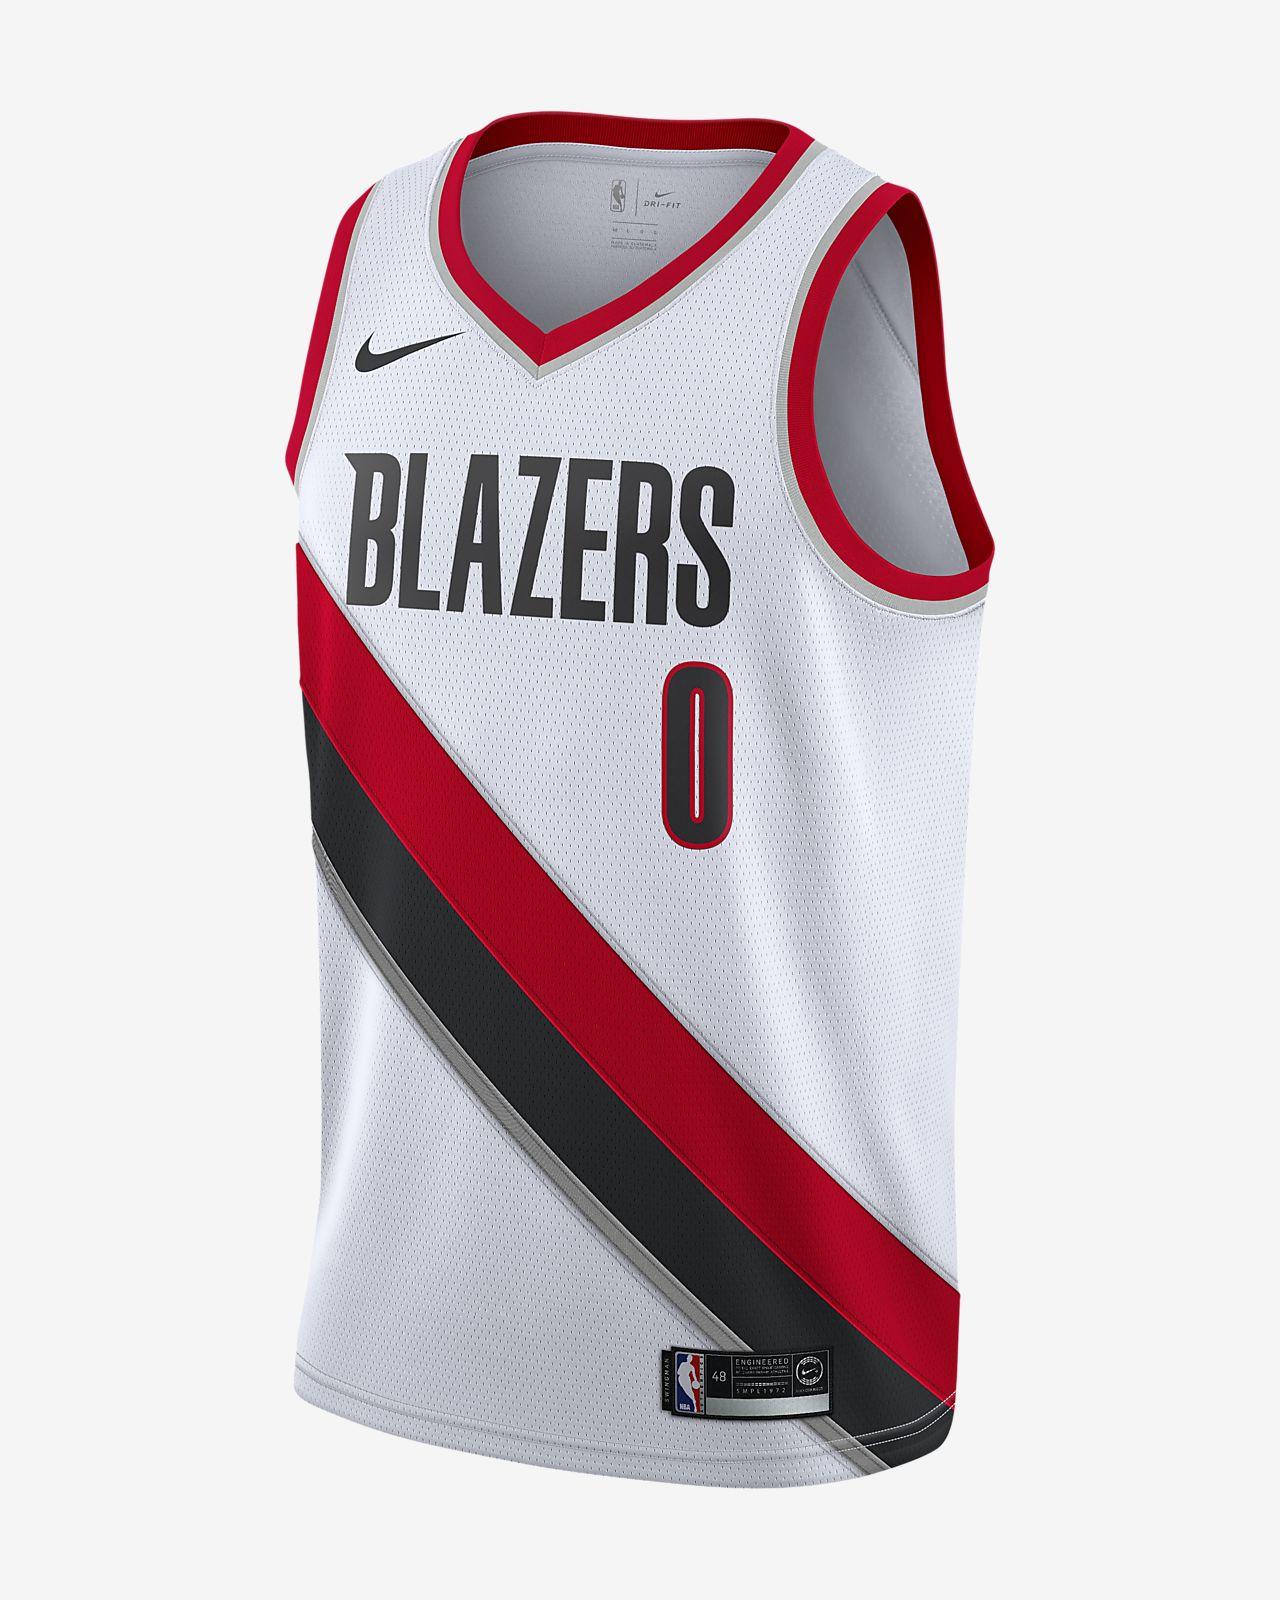 Maillot connecté Nike NBA Damian Lillard Association Edition Swingman (Portland Trail Blazers) pour Homme